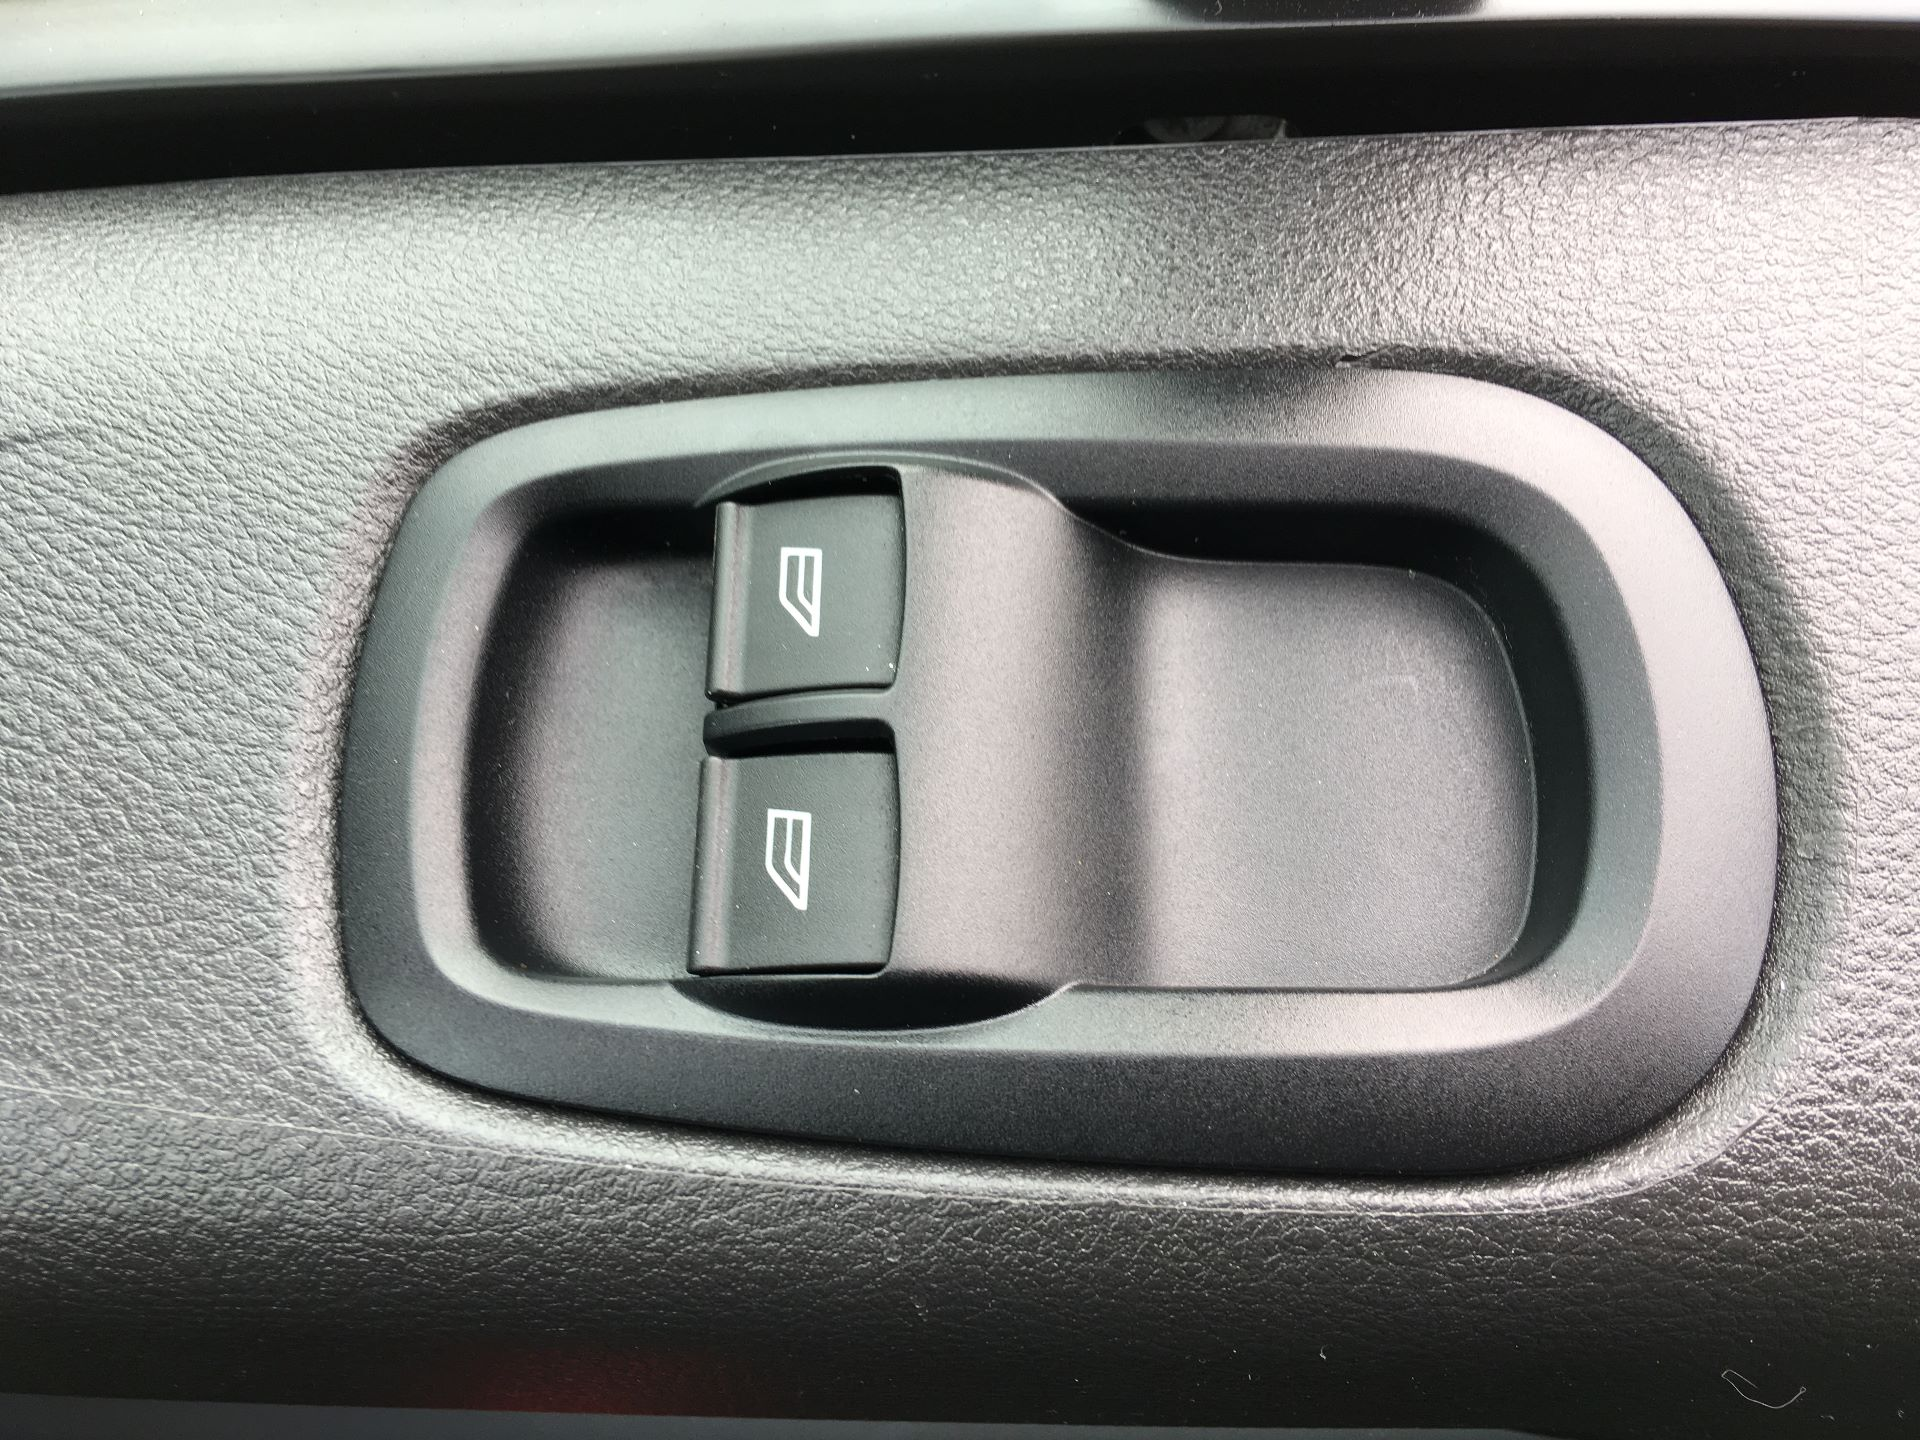 2016 Ford Transit Custom 290 L1 DIESEL FWD 2.0 TDCI 105PS HIGH ROOF VAN EURO 6 (SK66VKG) Image 7